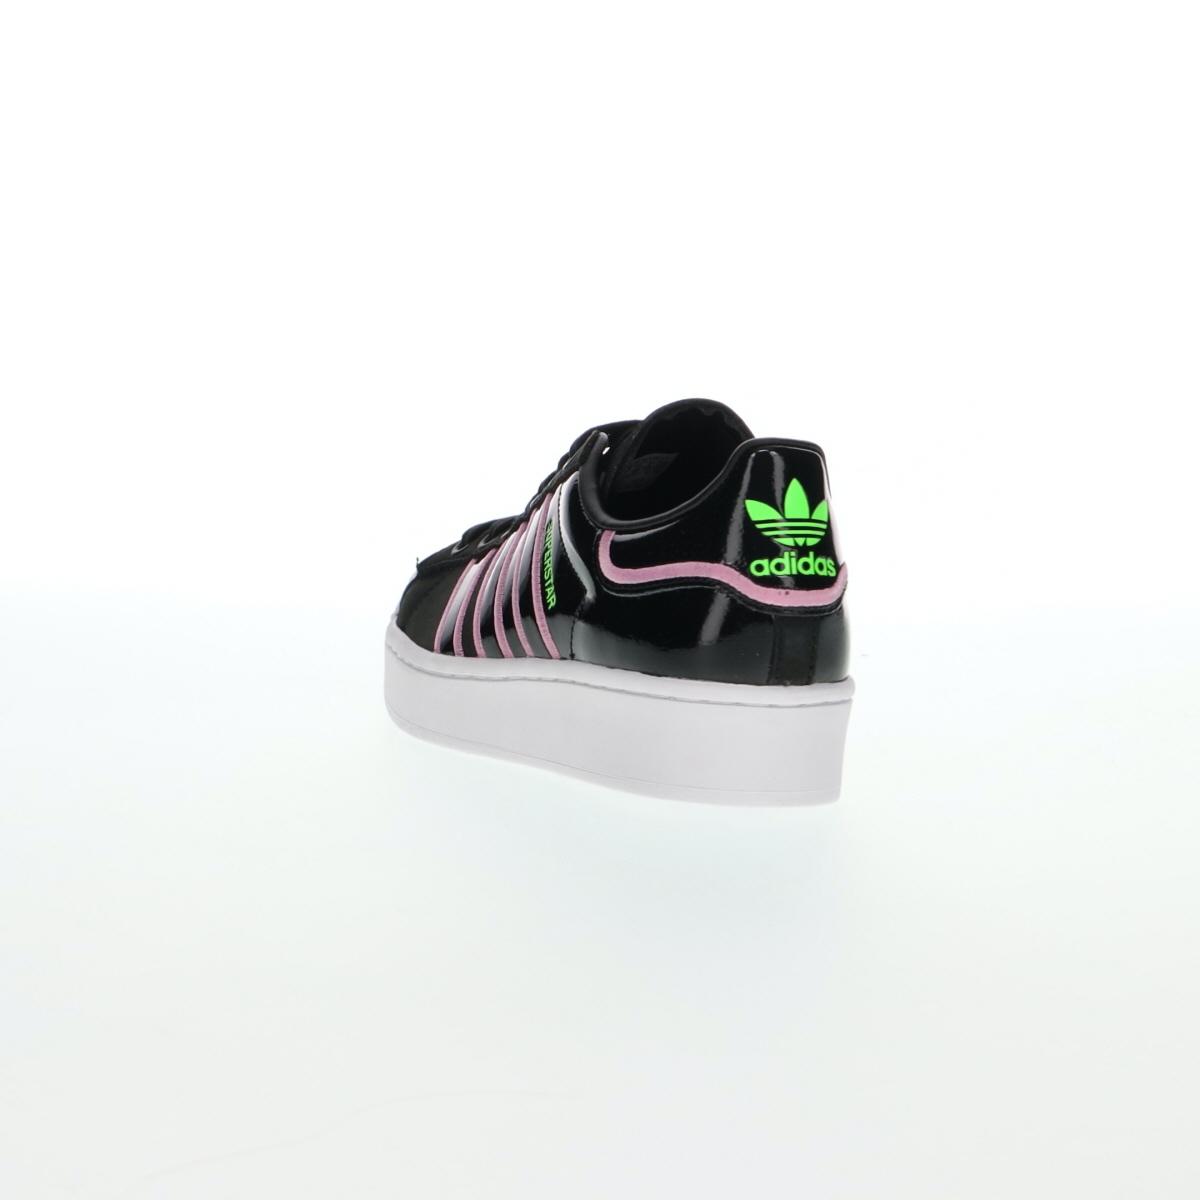 adidas ba7189 sneakers boys running black women